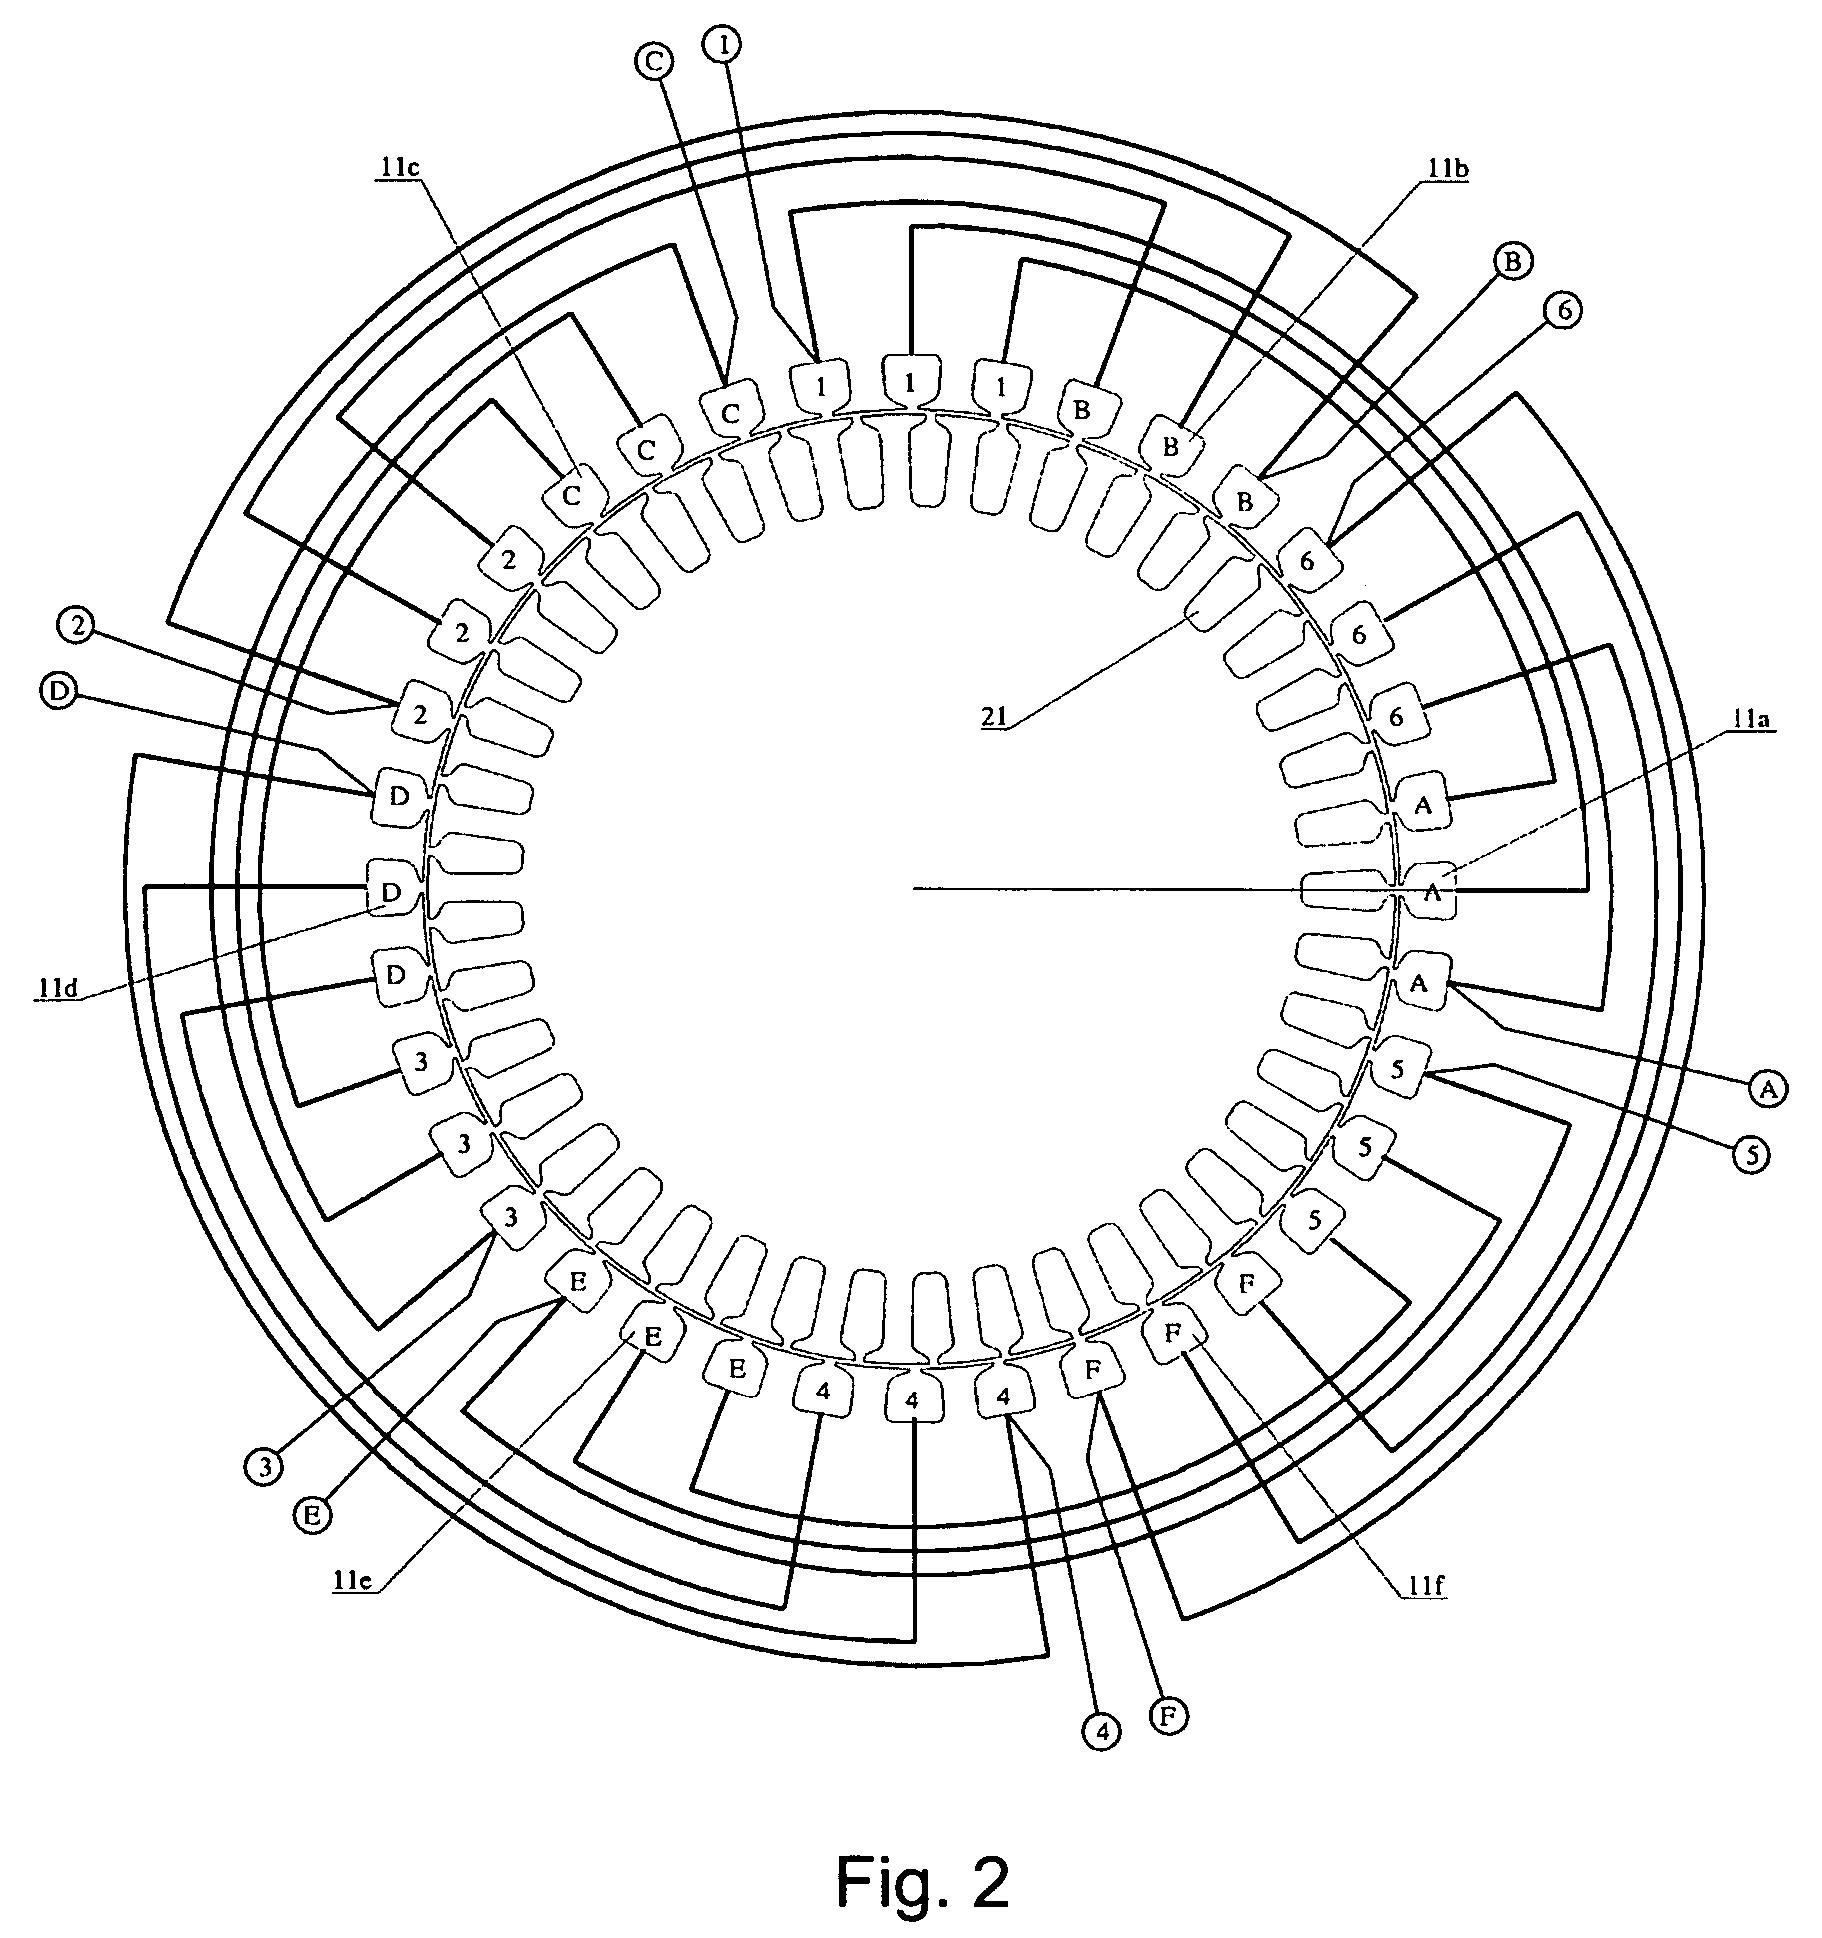 Ac Motor Winding Diagrams Wiring Diagram 2006 Kawasaki 360 Wiring Diagram Wire Diag Jeanjaures37 Fr